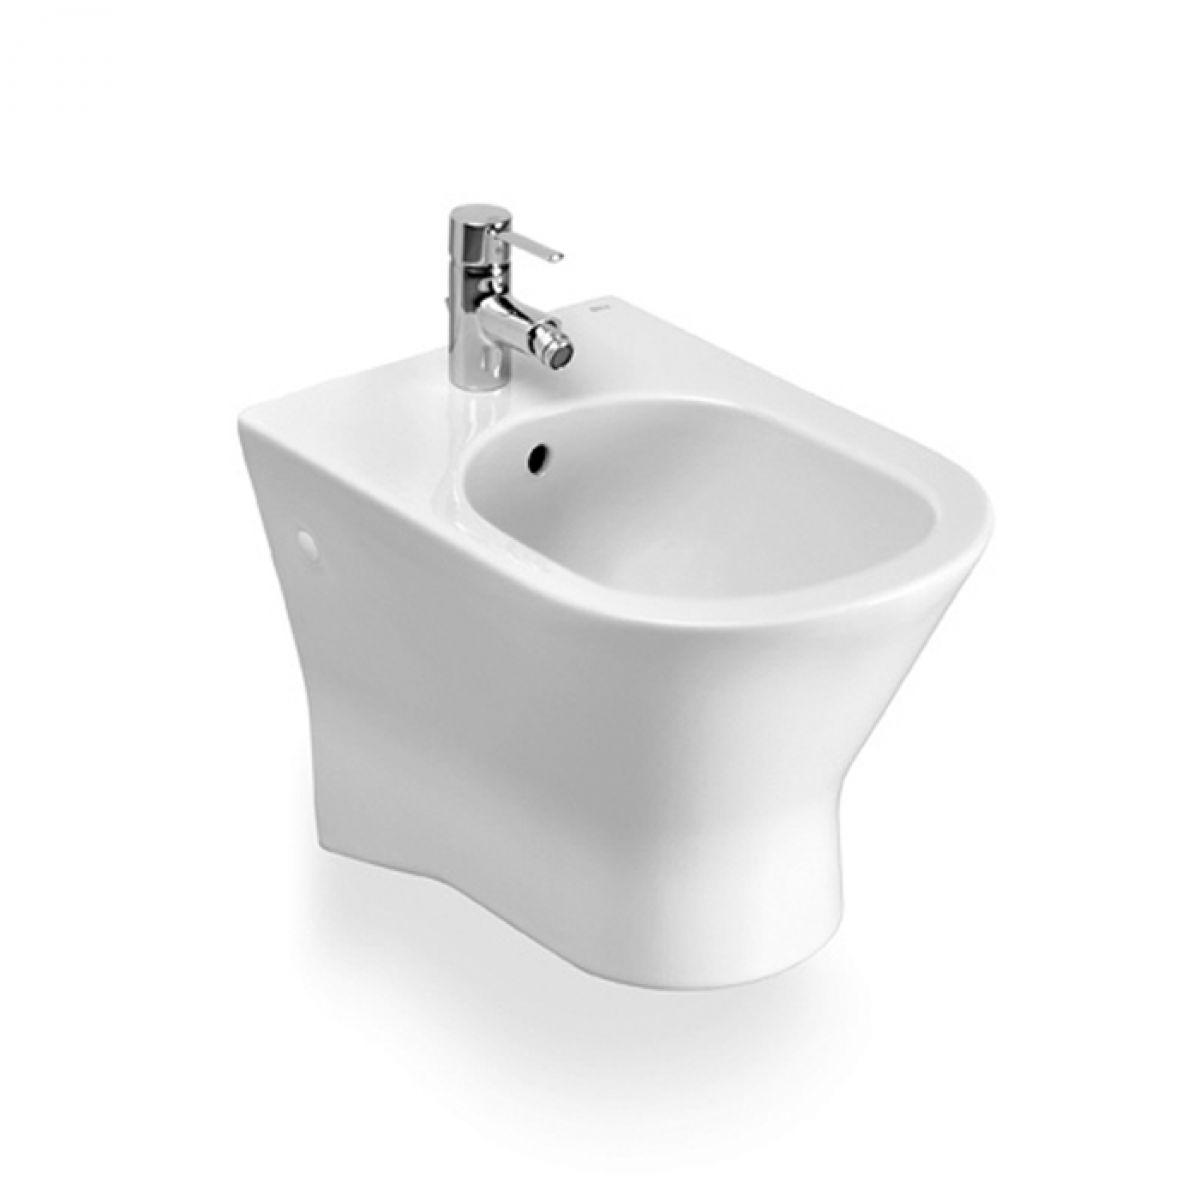 Roca Nexo Wall Hung Bidet Uk Bathrooms